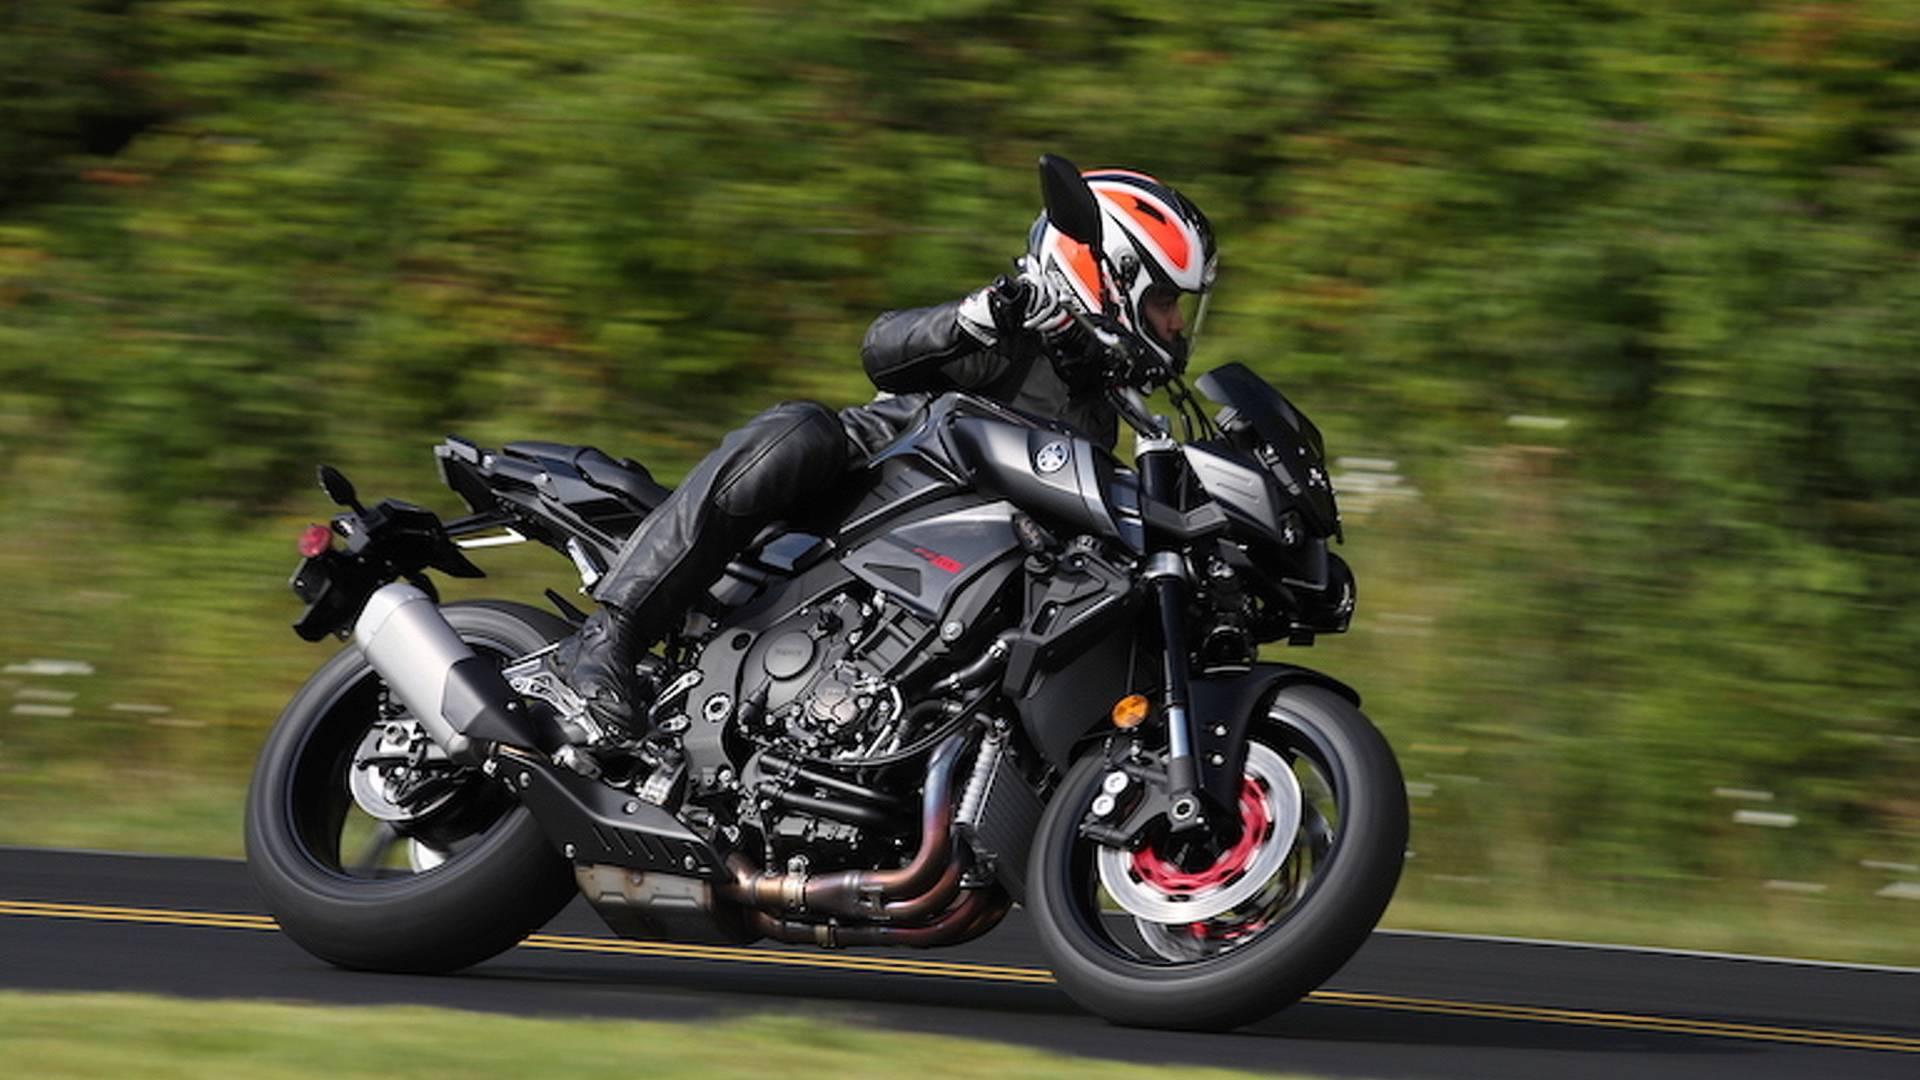 2017 Yamaha FZ10 Sport Motorcycle Model Home Motorcycles